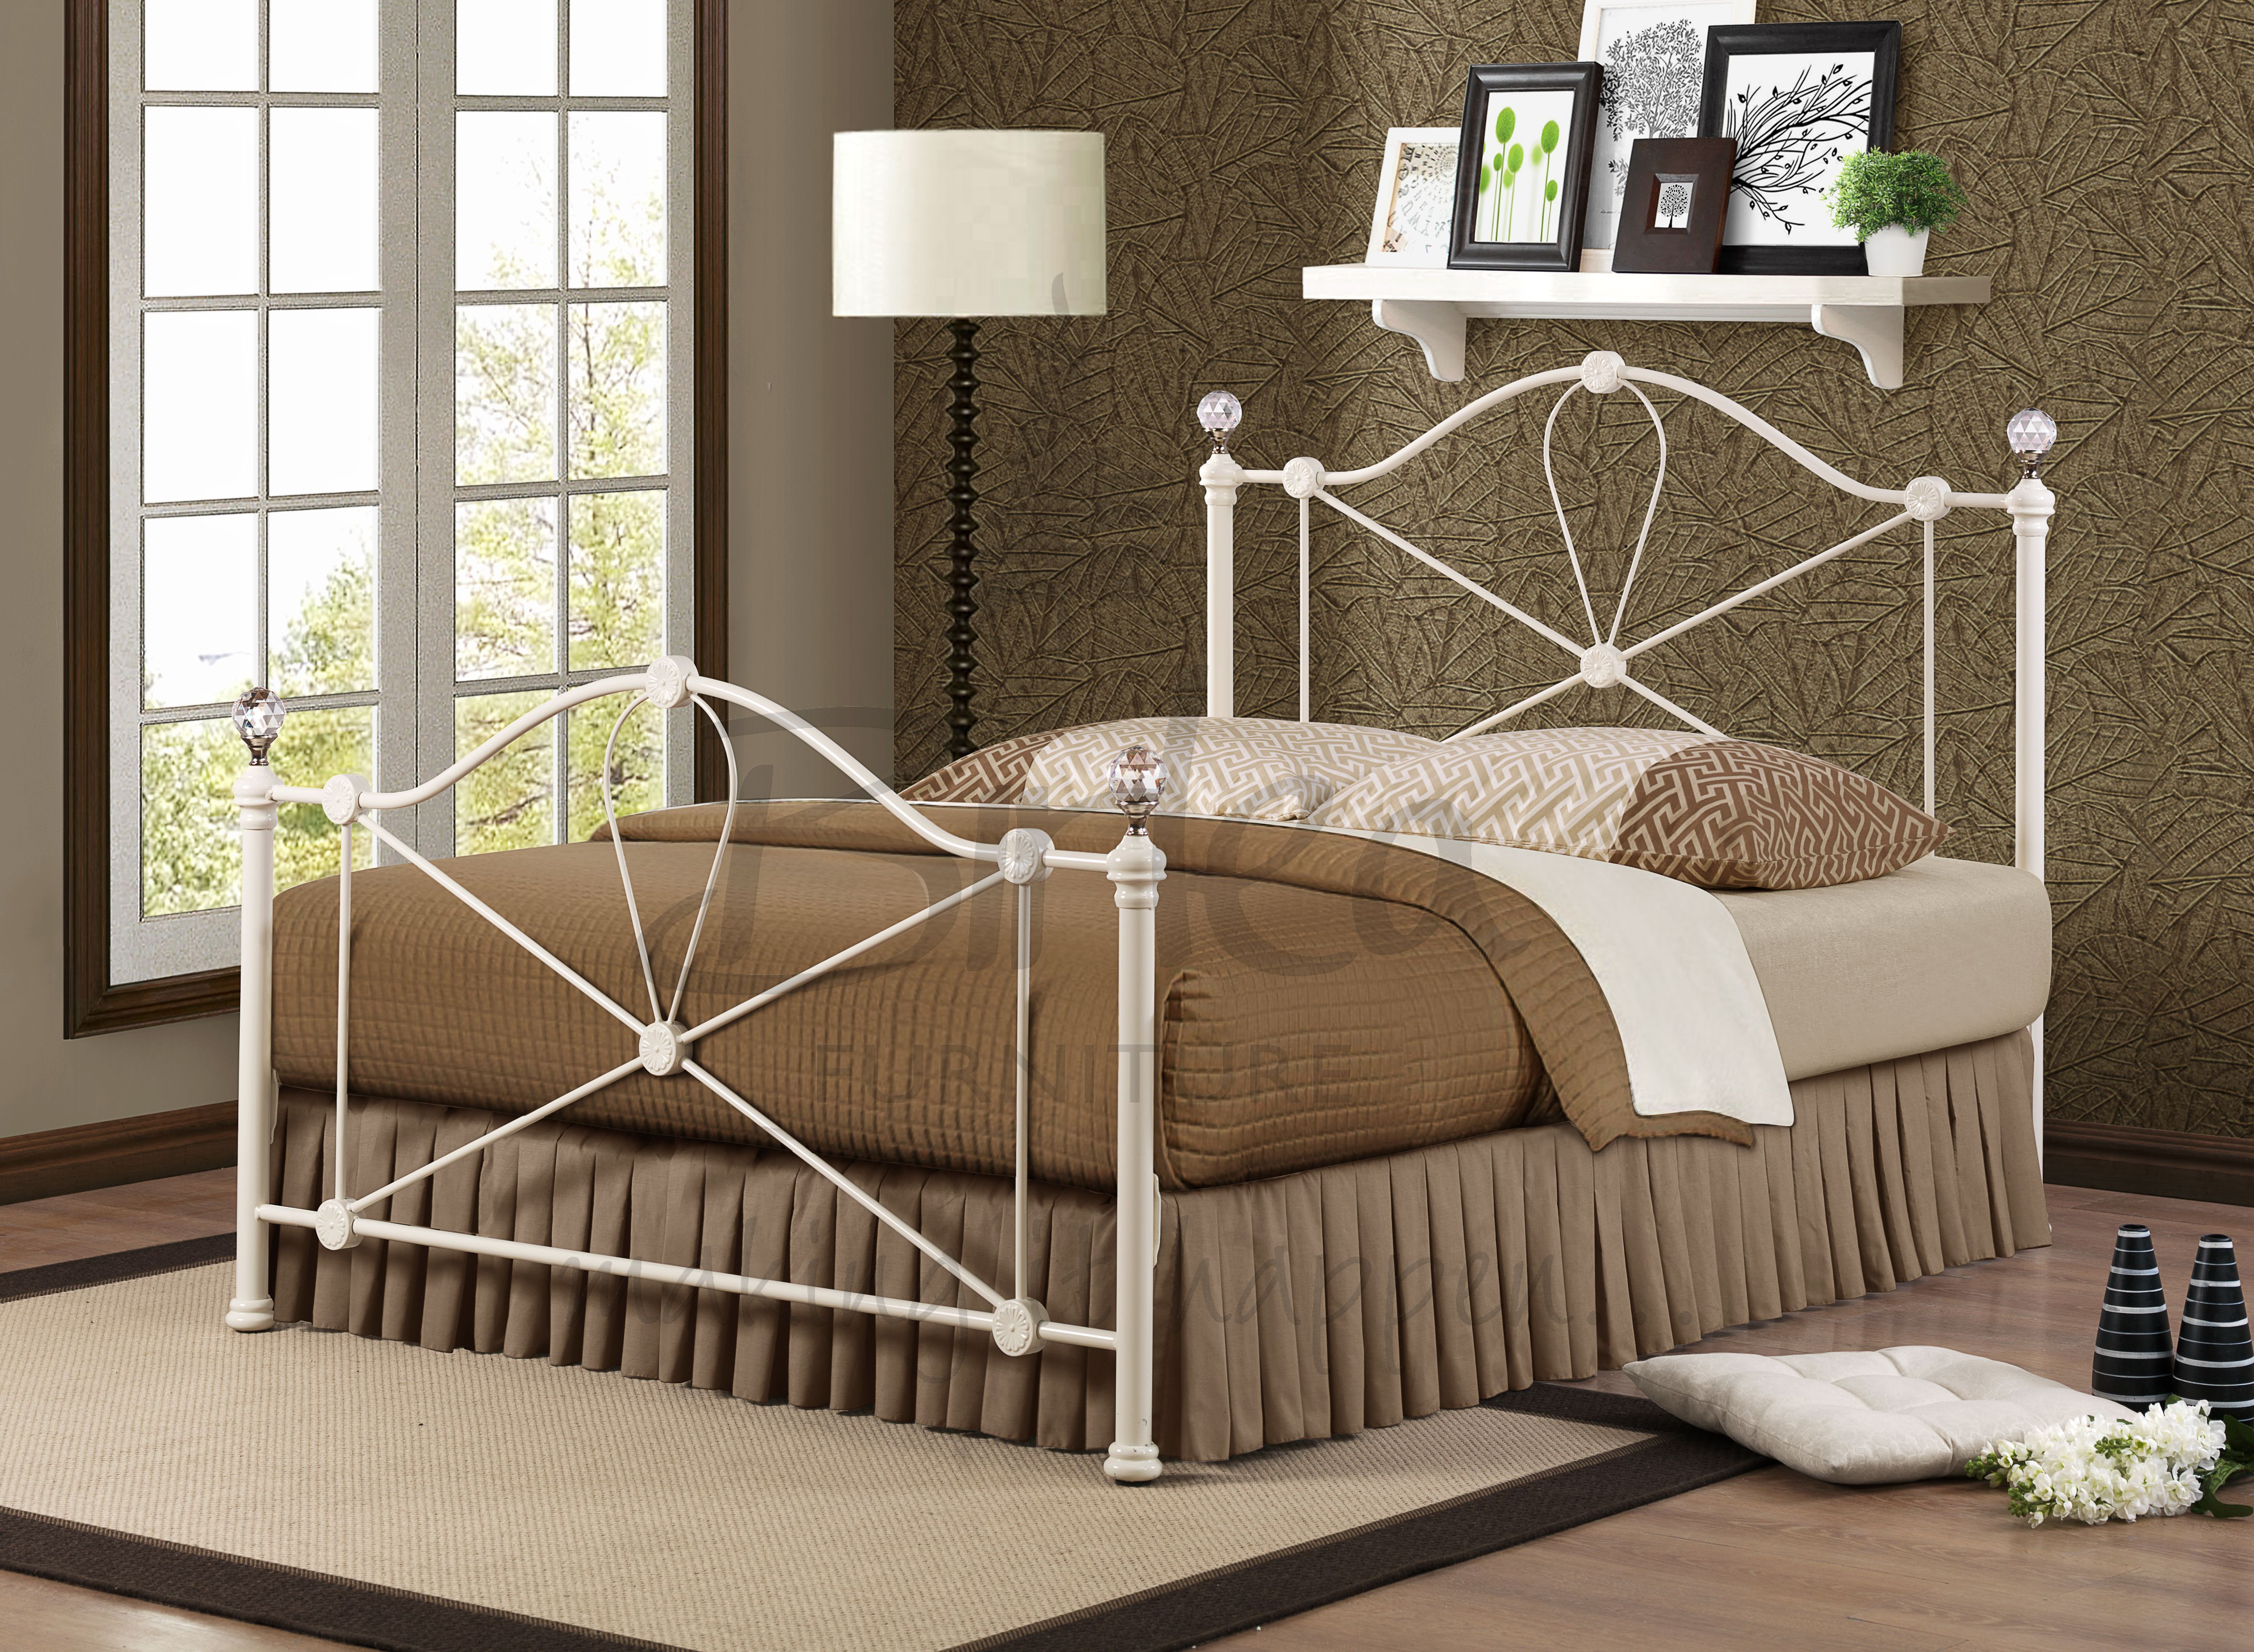 Modern Metal Bed Frames jasmine crystal cream finish double (app 4ft6 135cm) modern metal